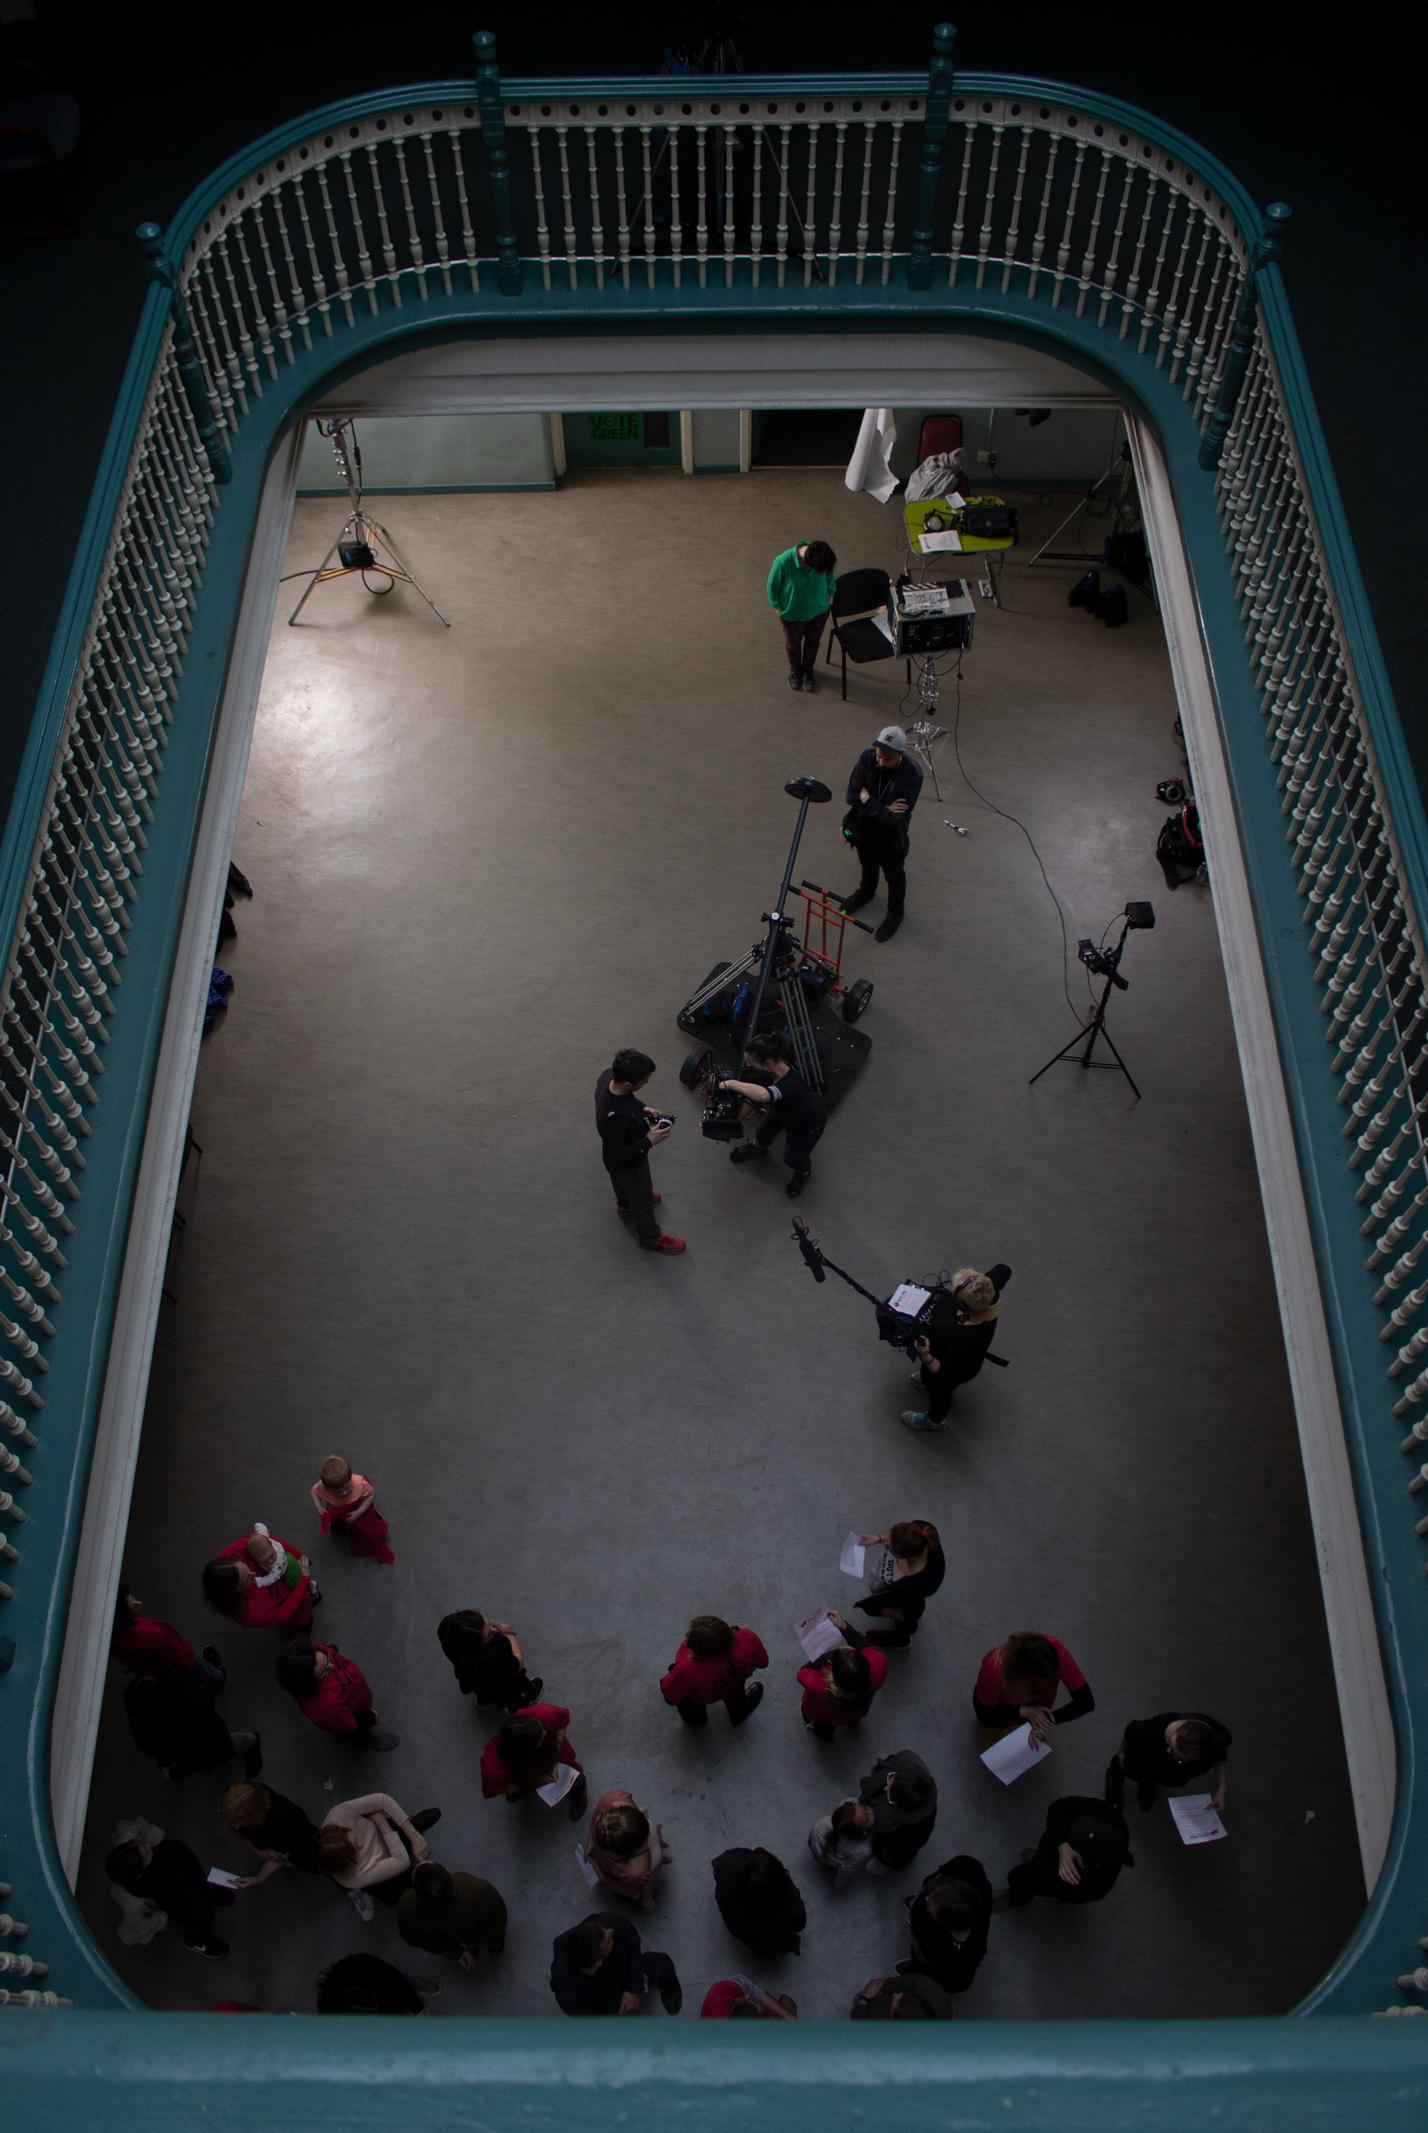 Petra Bauer & SCOT-PEP, Workers!, film still, 2018